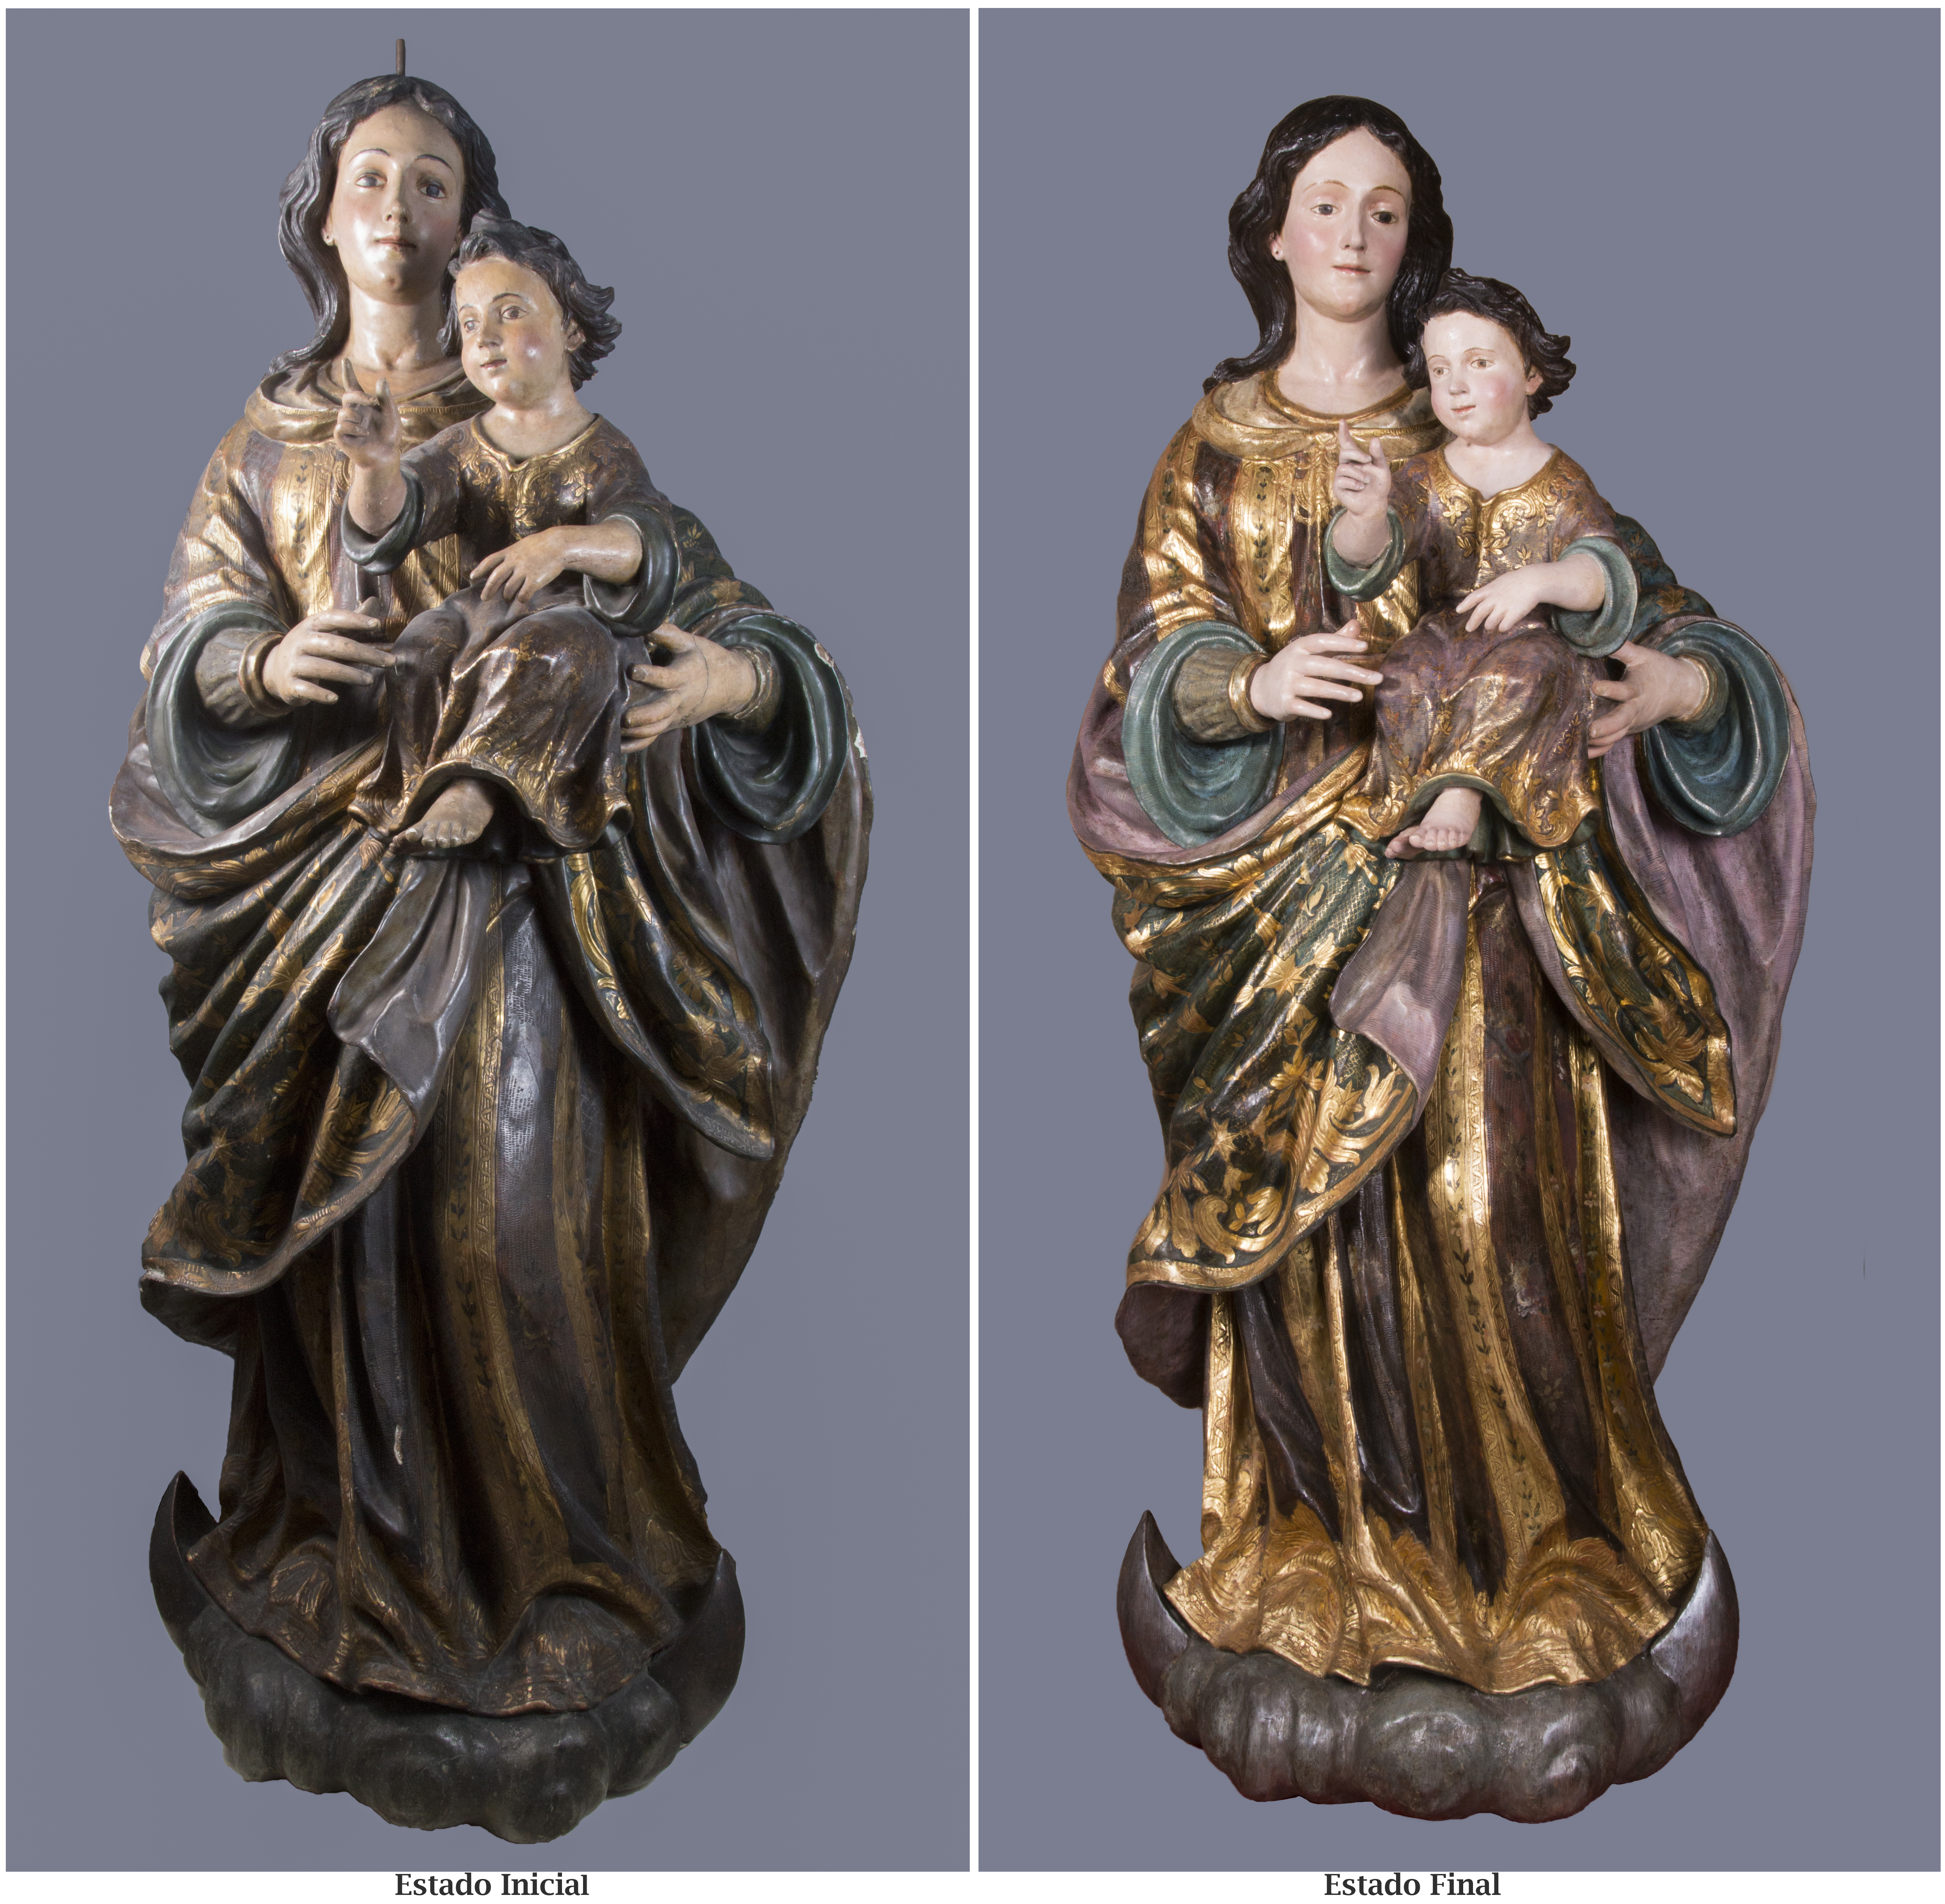 estauracion.v.rosario.sanjacinto.13